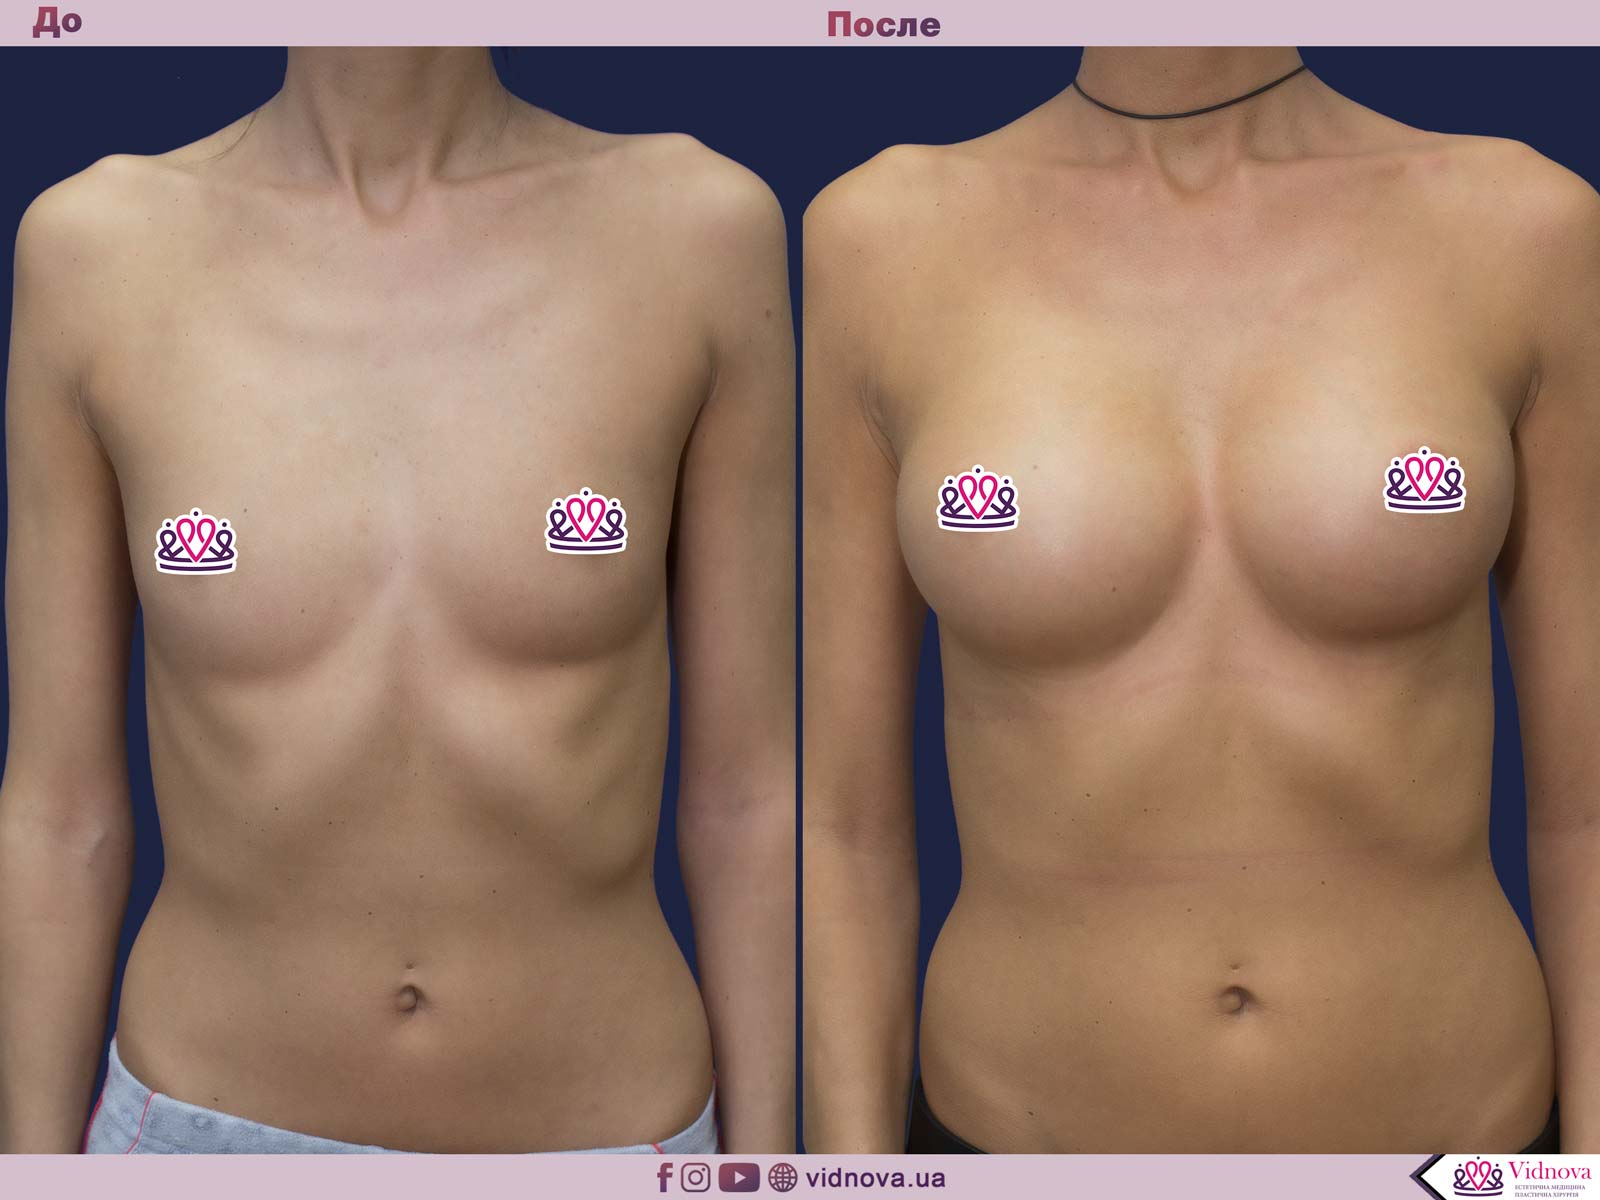 Увеличение груди: Фото ДО и ПОСЛЕ - Пример №60-1 - Клиника Vidnova